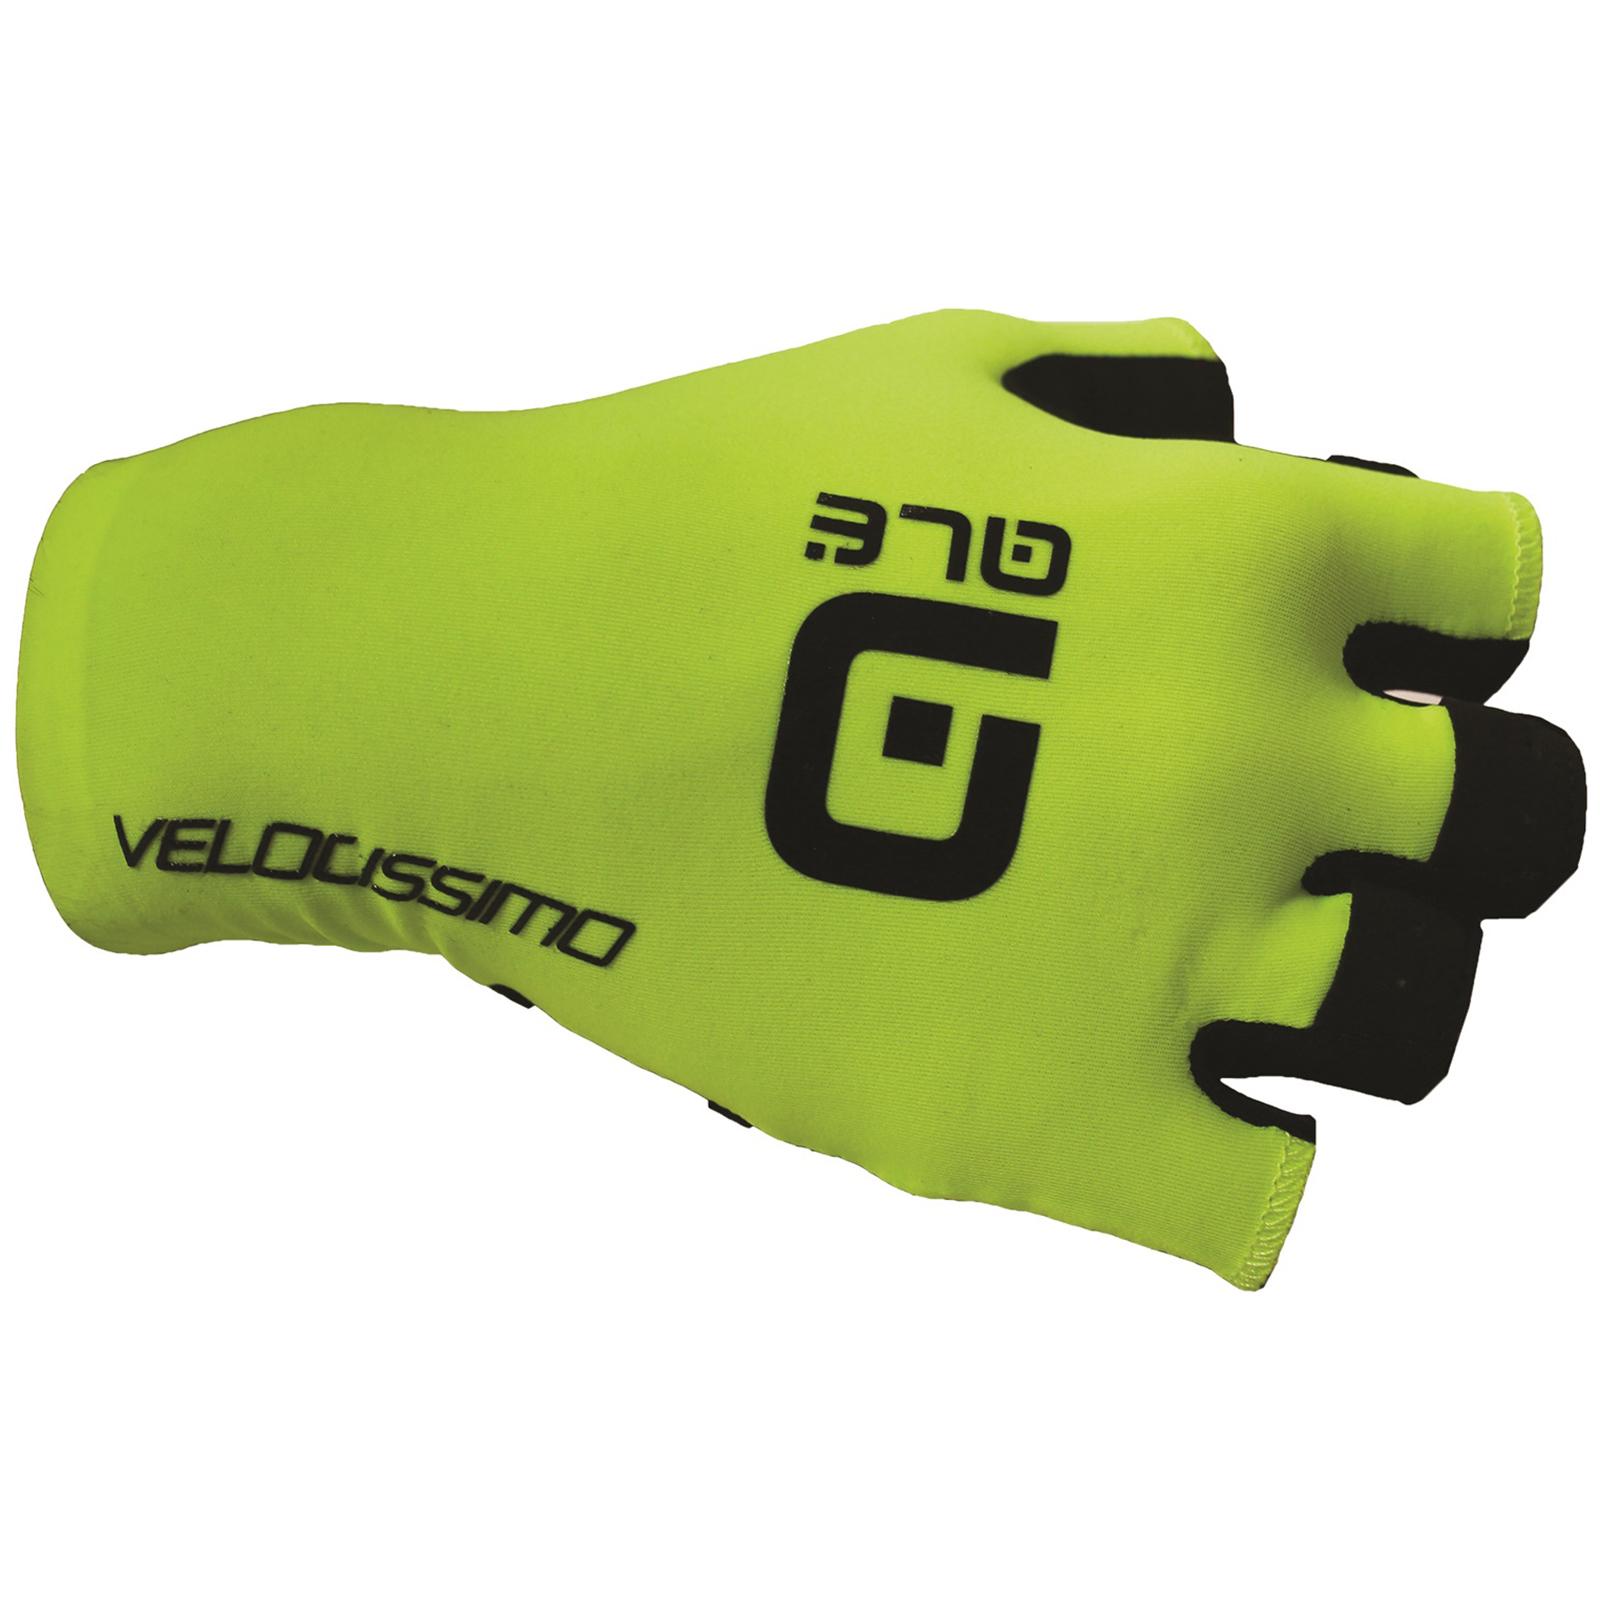 Al Chrono Gloves - Yellow/black - S - Yellow/black